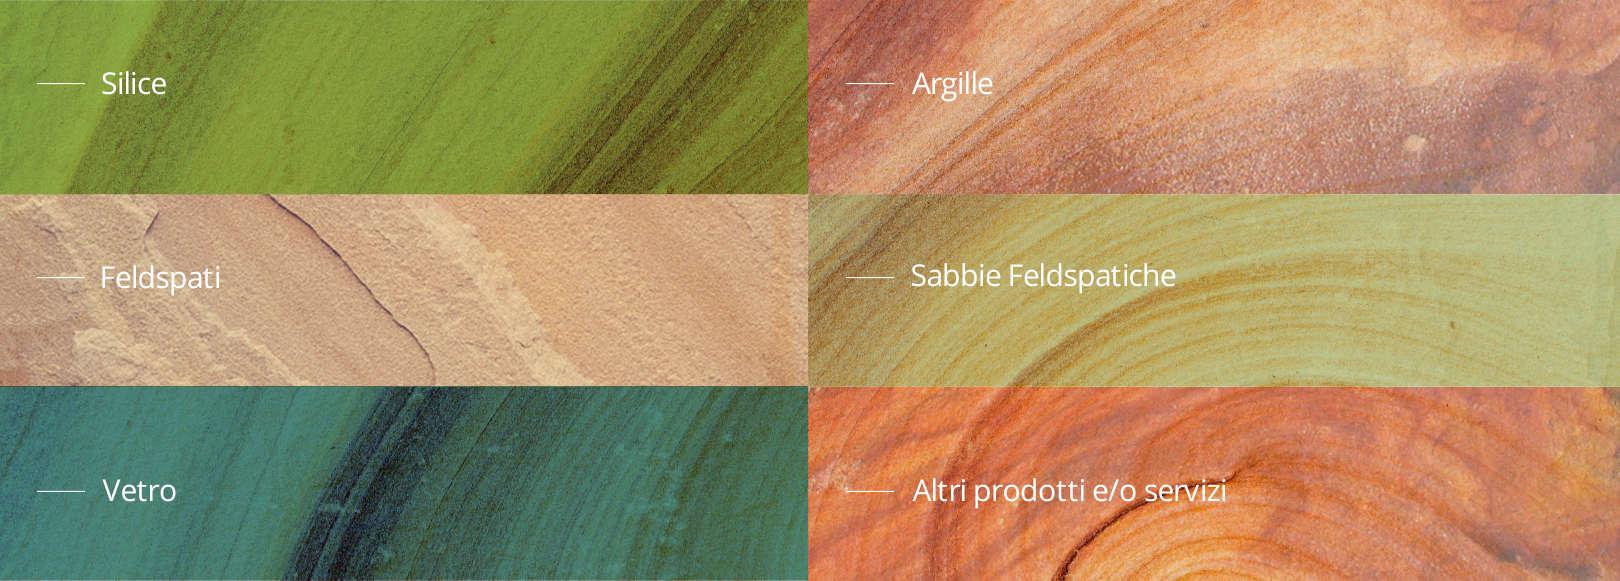 materie Prime Minerali industriali - silice, argille, feldspati, vetro, sabbie feldspatiche